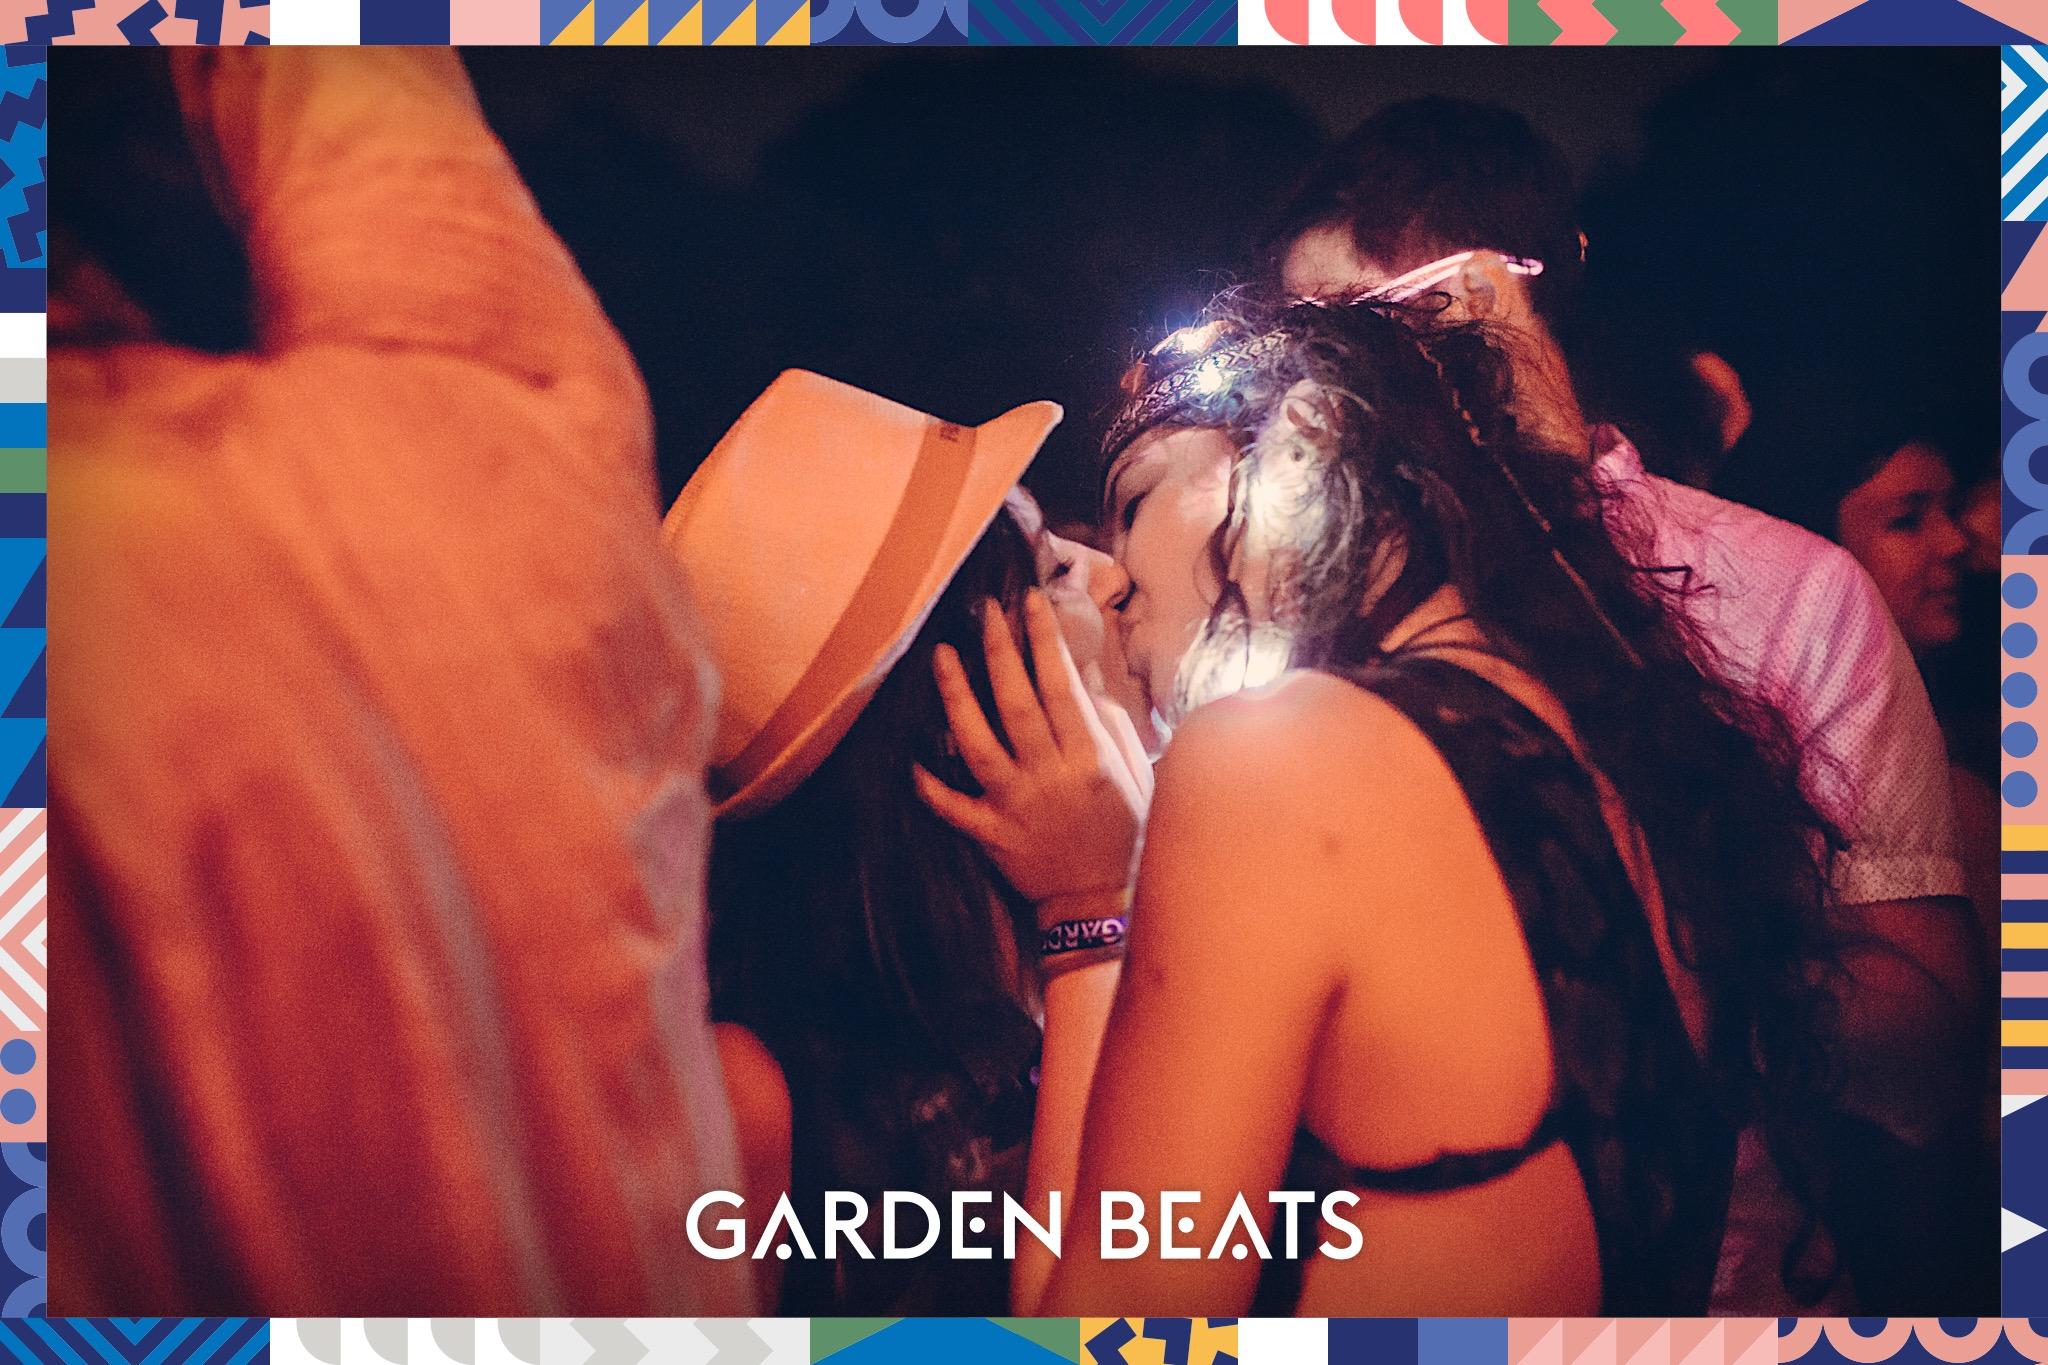 18032017_GardenBeats_Colossal893_WatermarkedGB.jpg